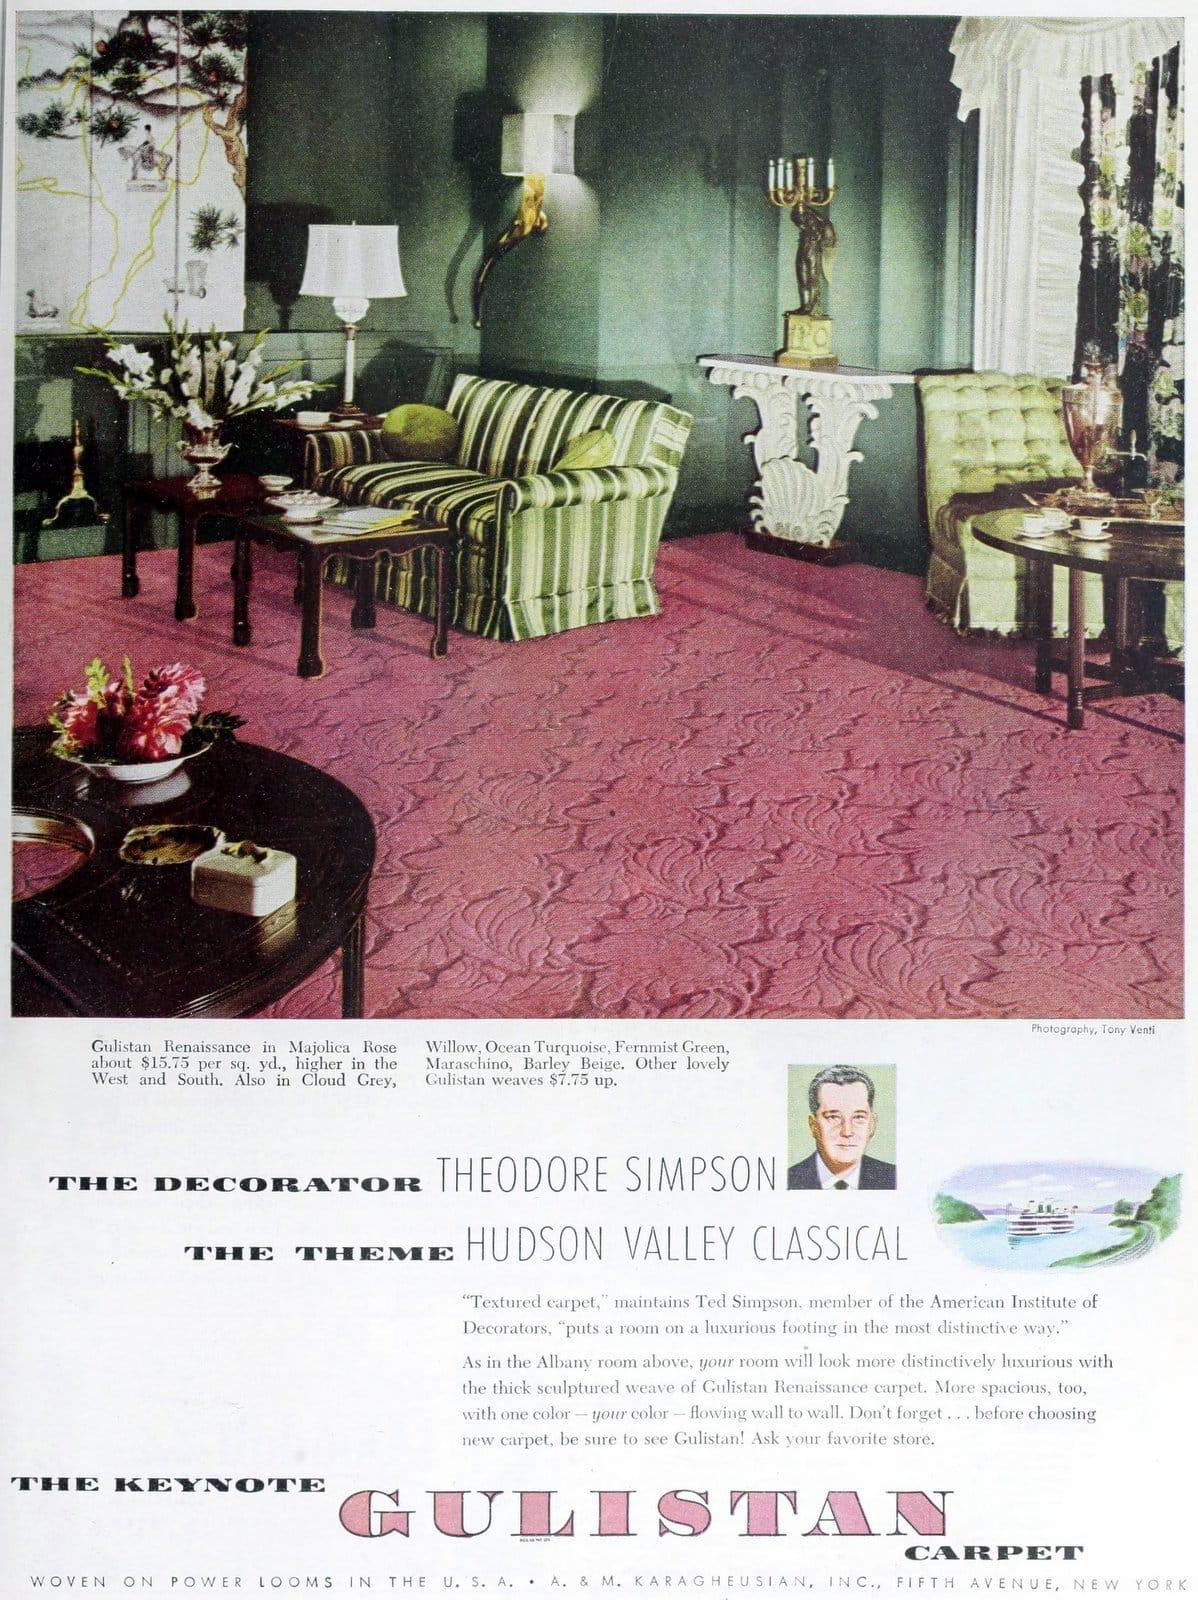 Vintage pink floral Gulistan textured carpet (1949)